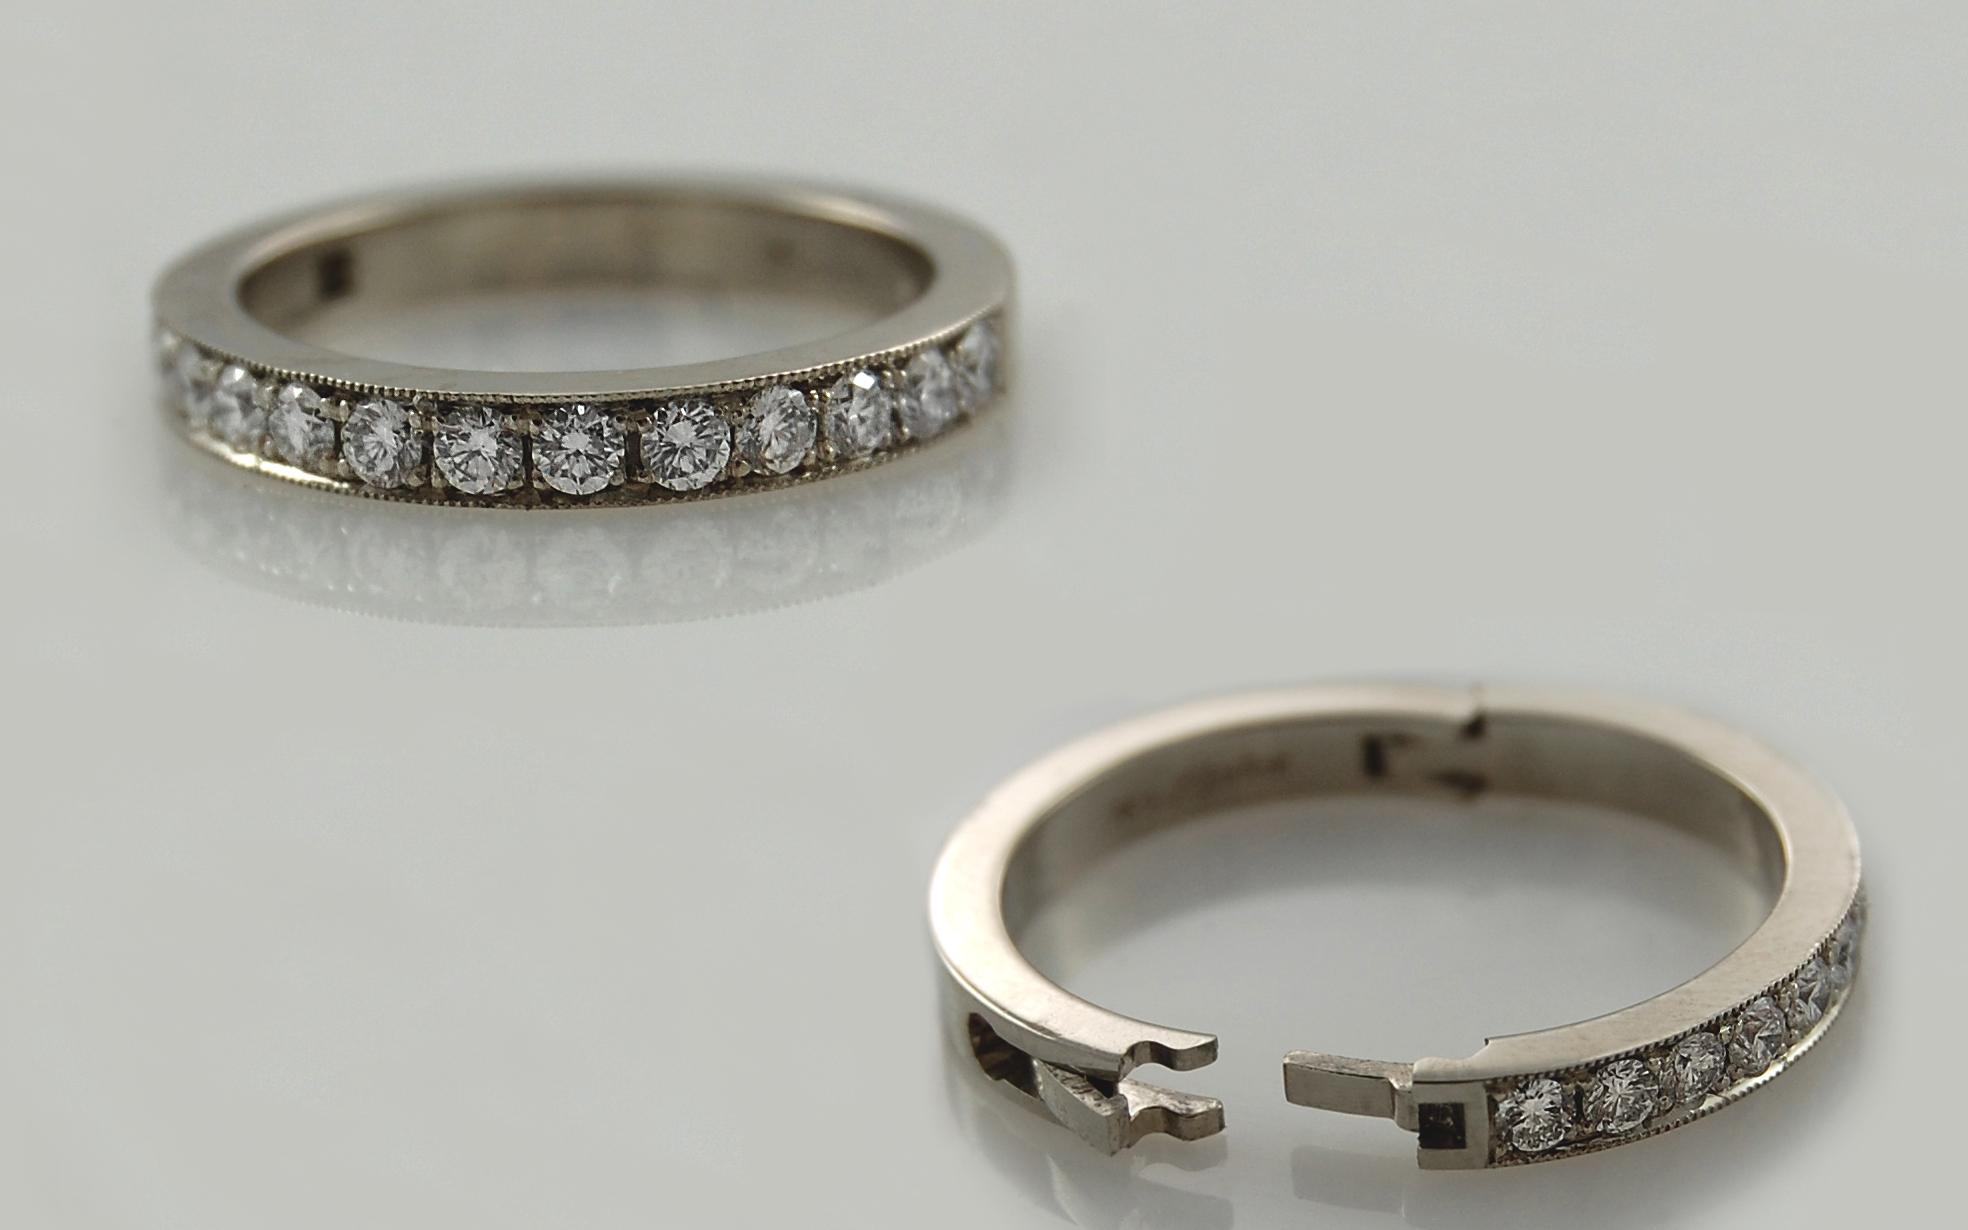 Bead Set Diamonds on 3mm Superfit Band